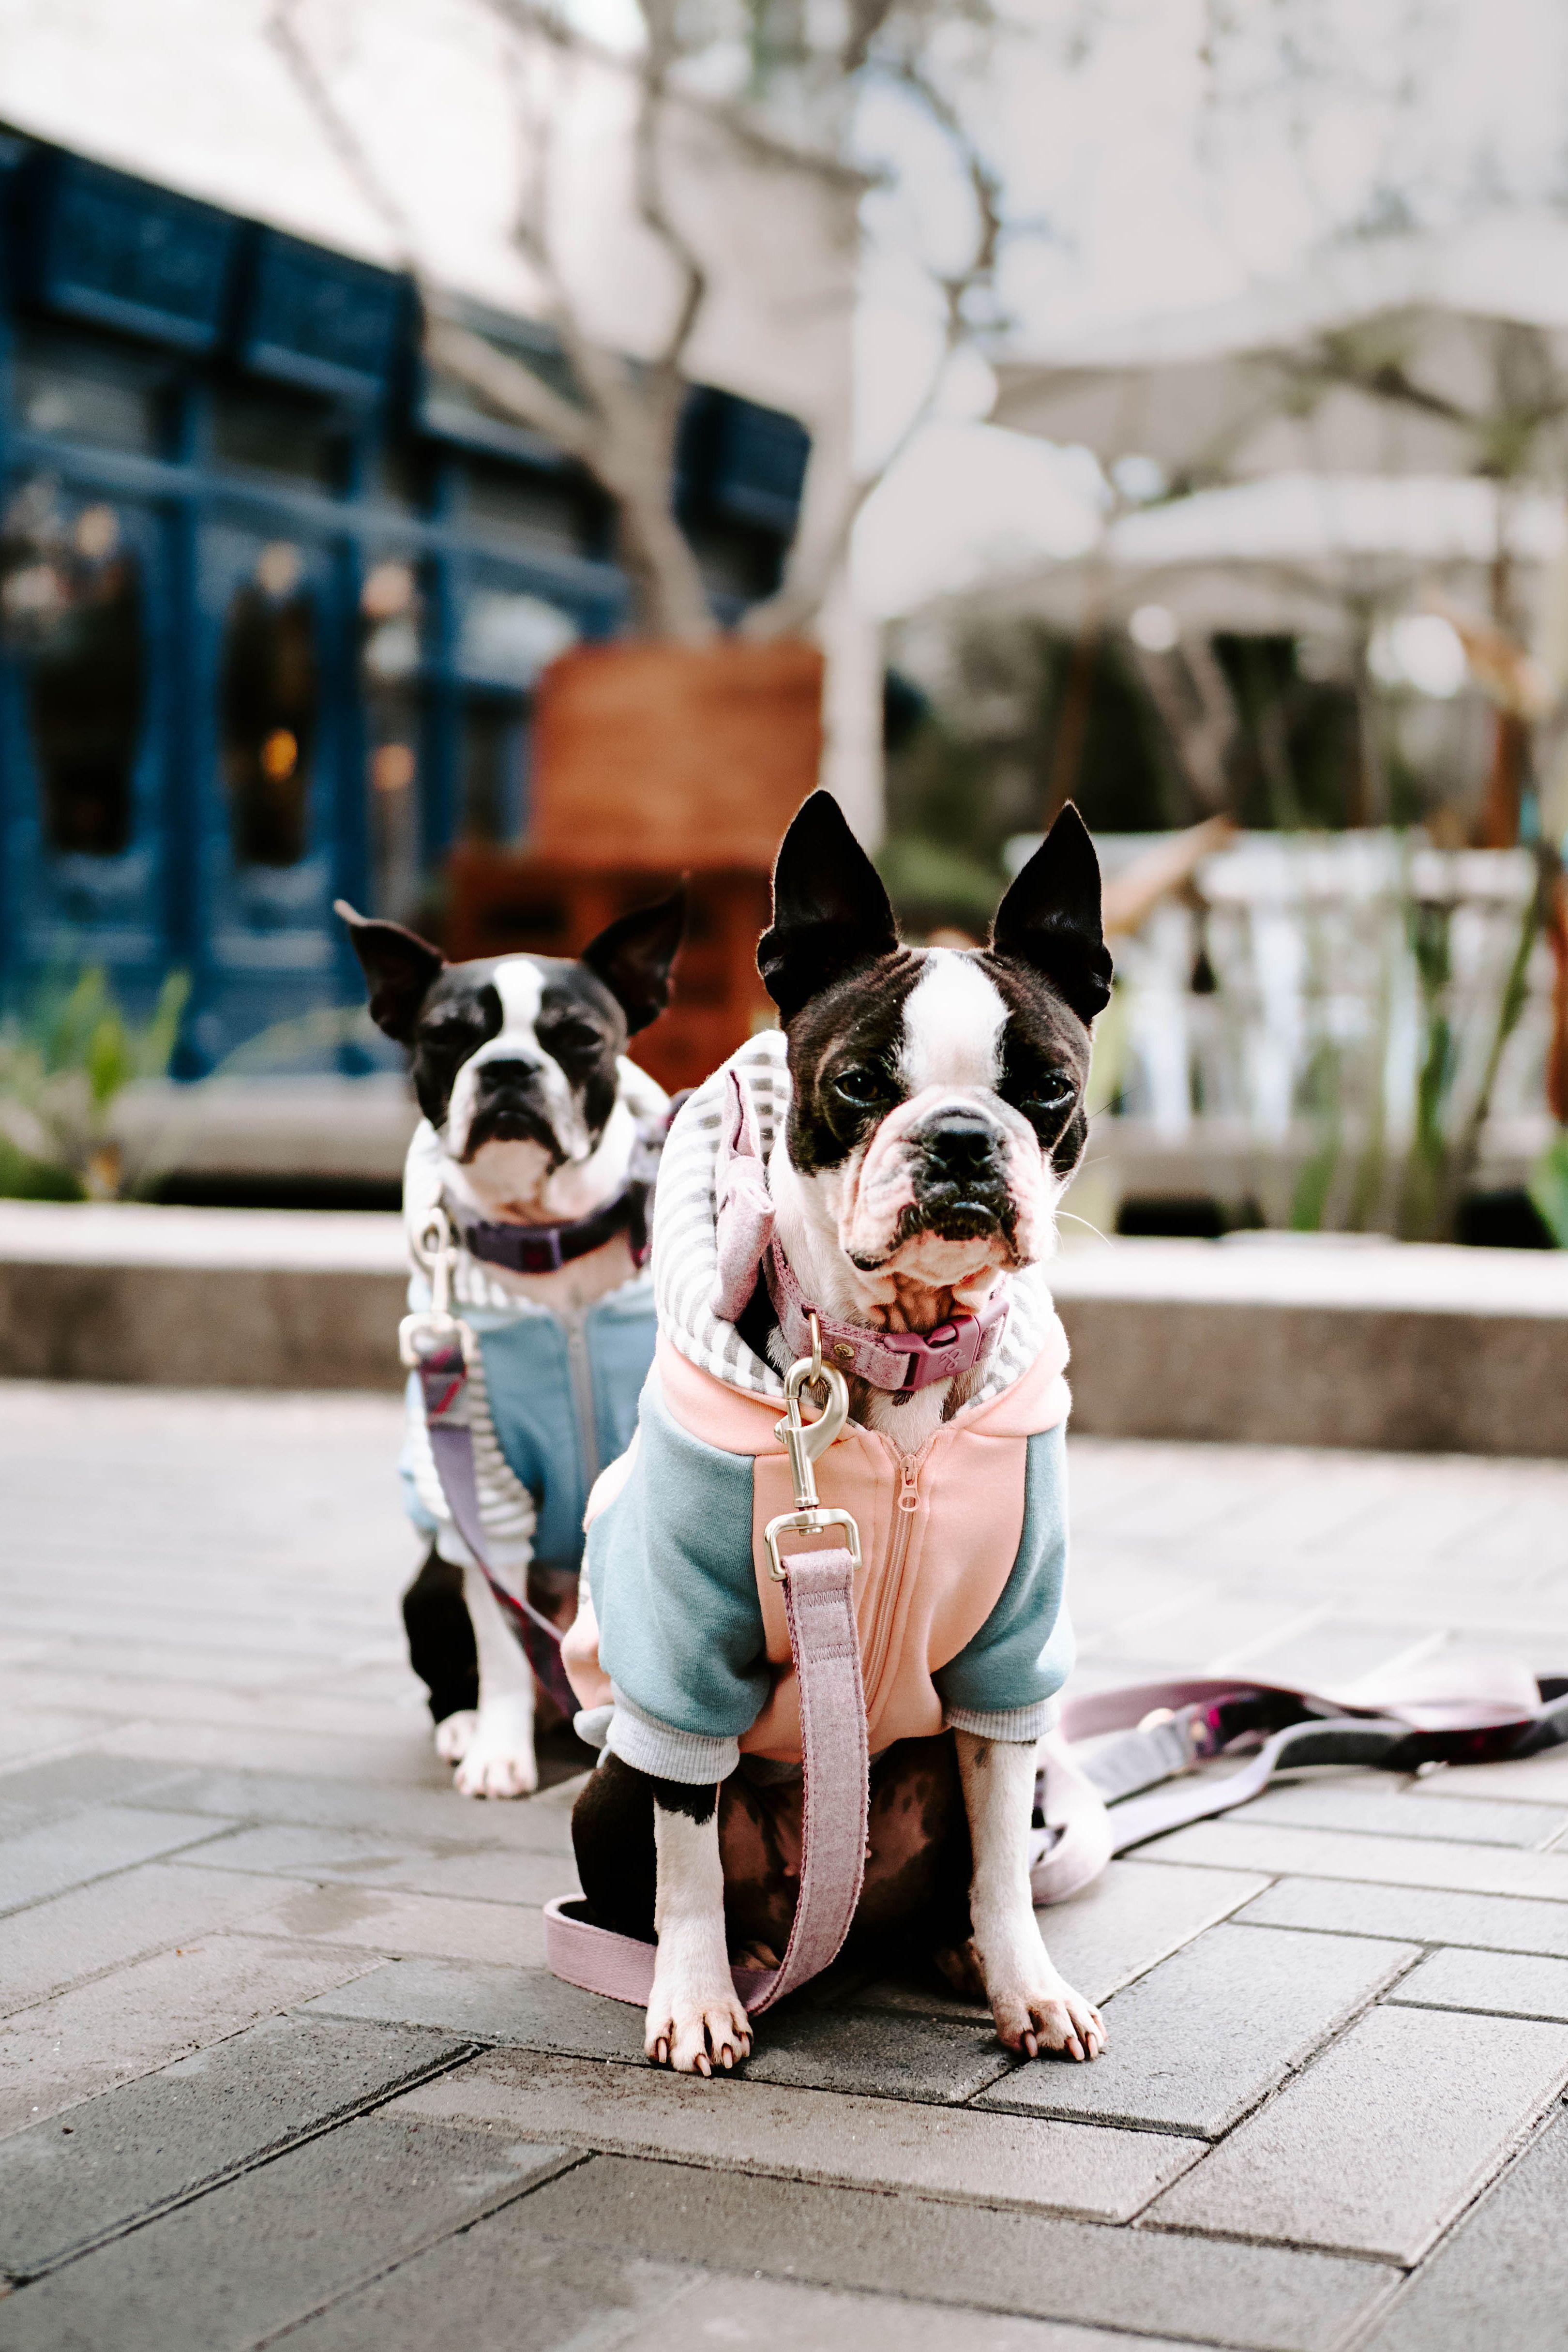 It S Sunny Day And Walking Day Dogs Pets Doglovers Animals Dog Leash Training Dog Training Near Me Guard Dog Training